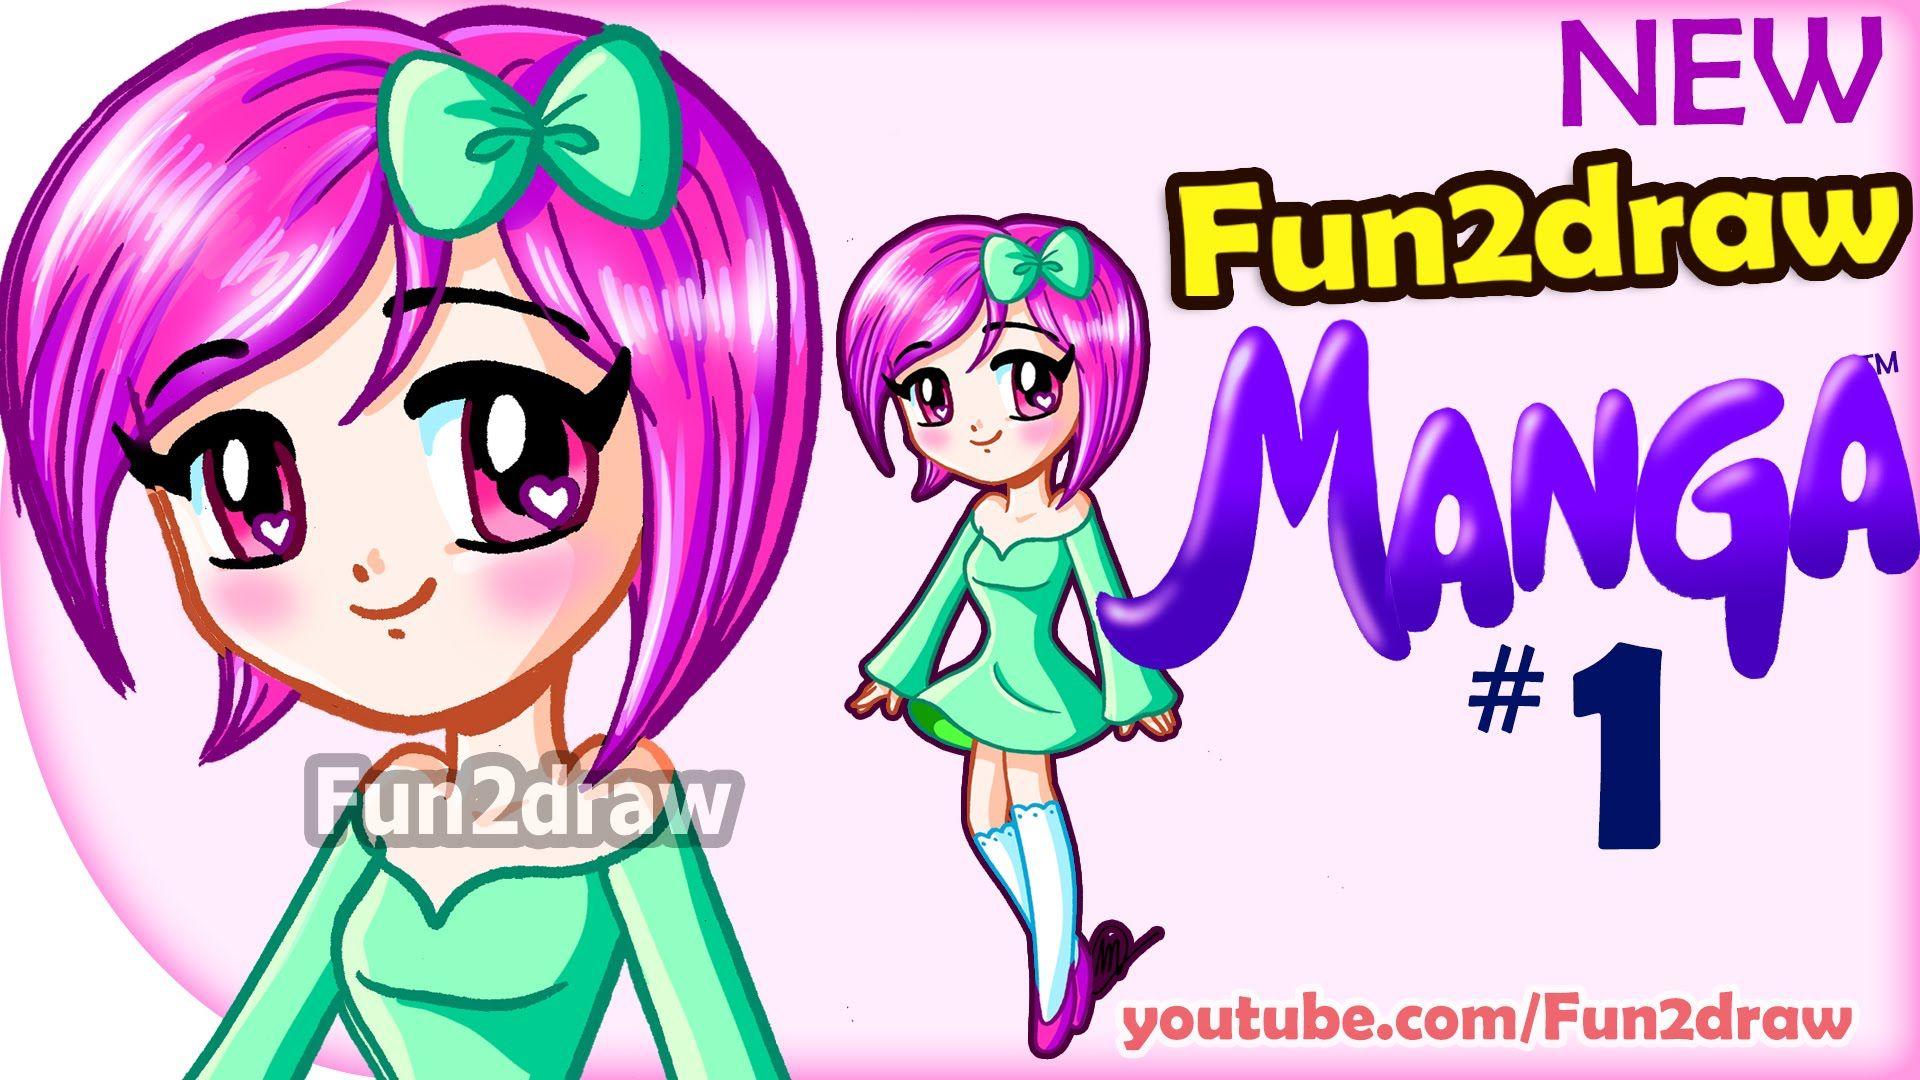 How to draw anime manga easy new fundraw manga cute girl